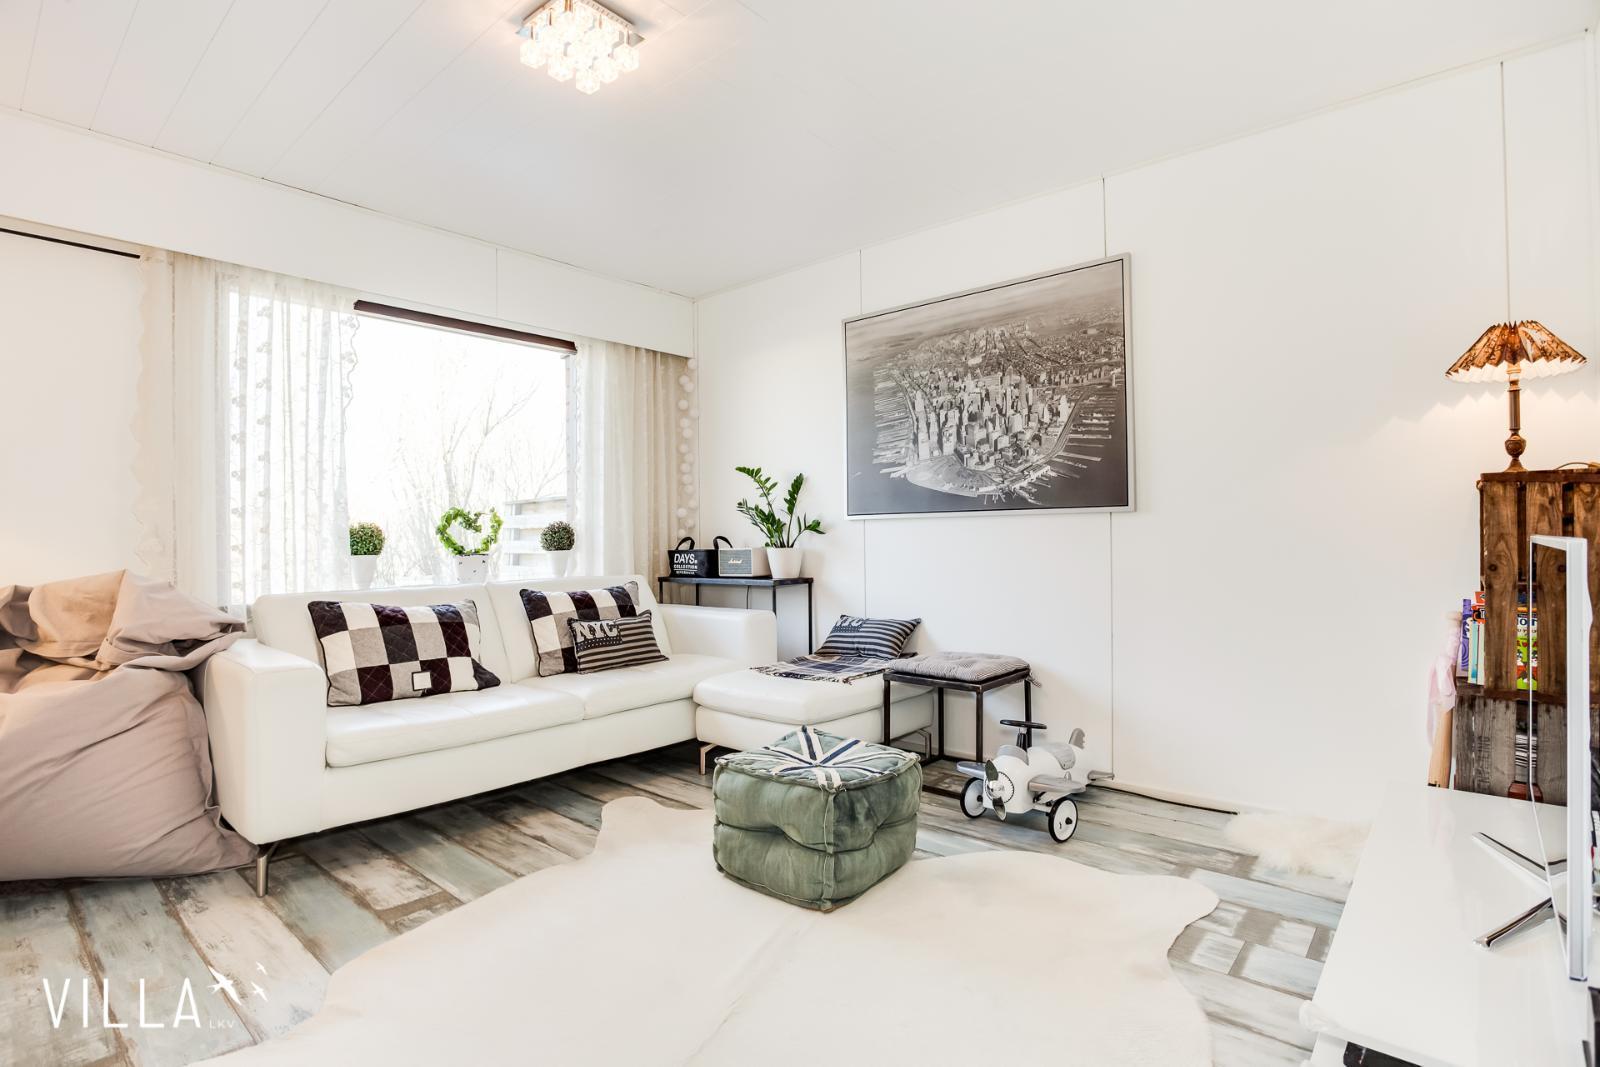 Moderni olohuone, sohva, VILLA LKV